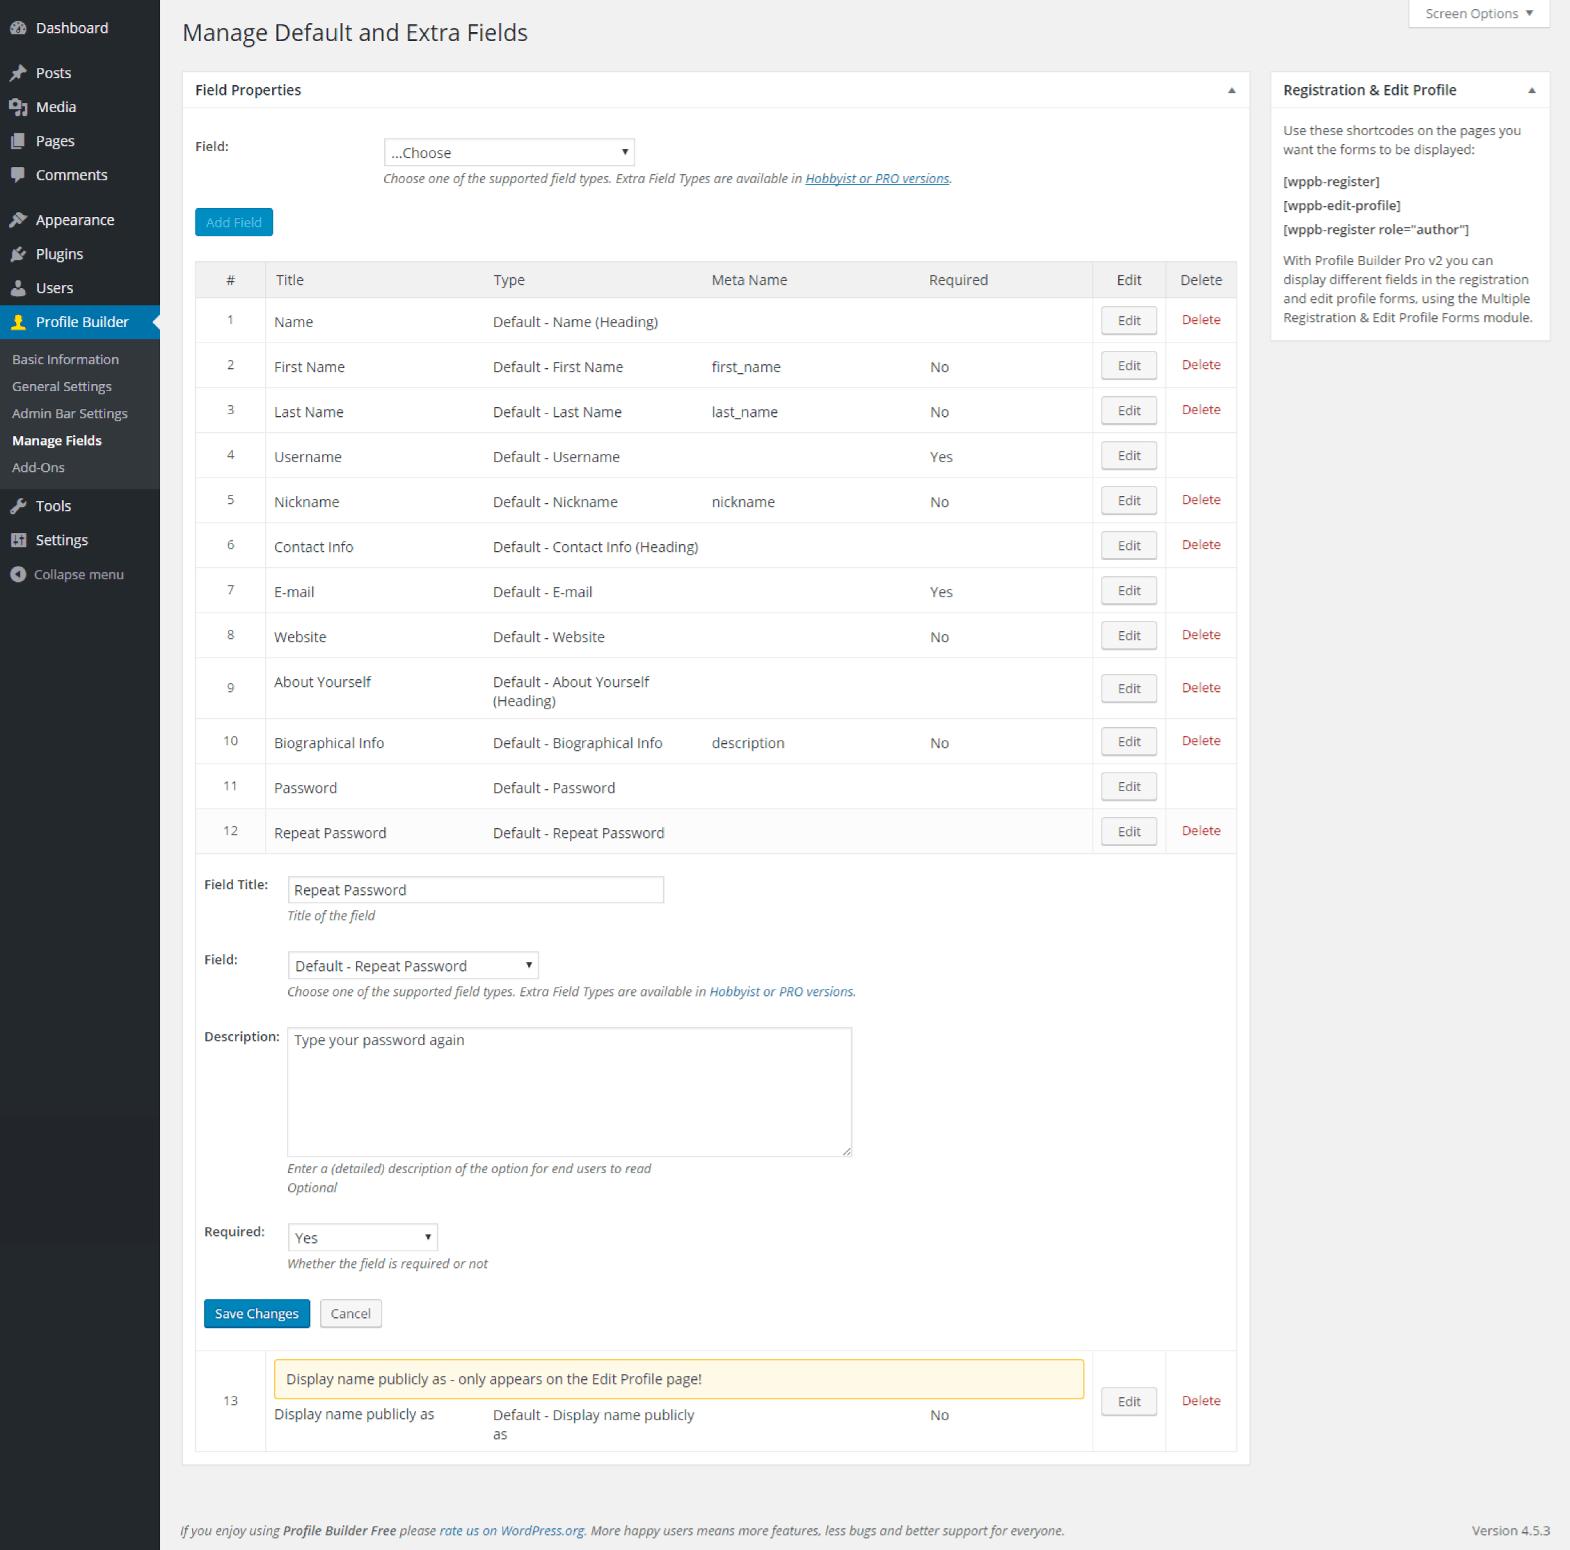 Profile Builder - Default Repeat Password Field Back End